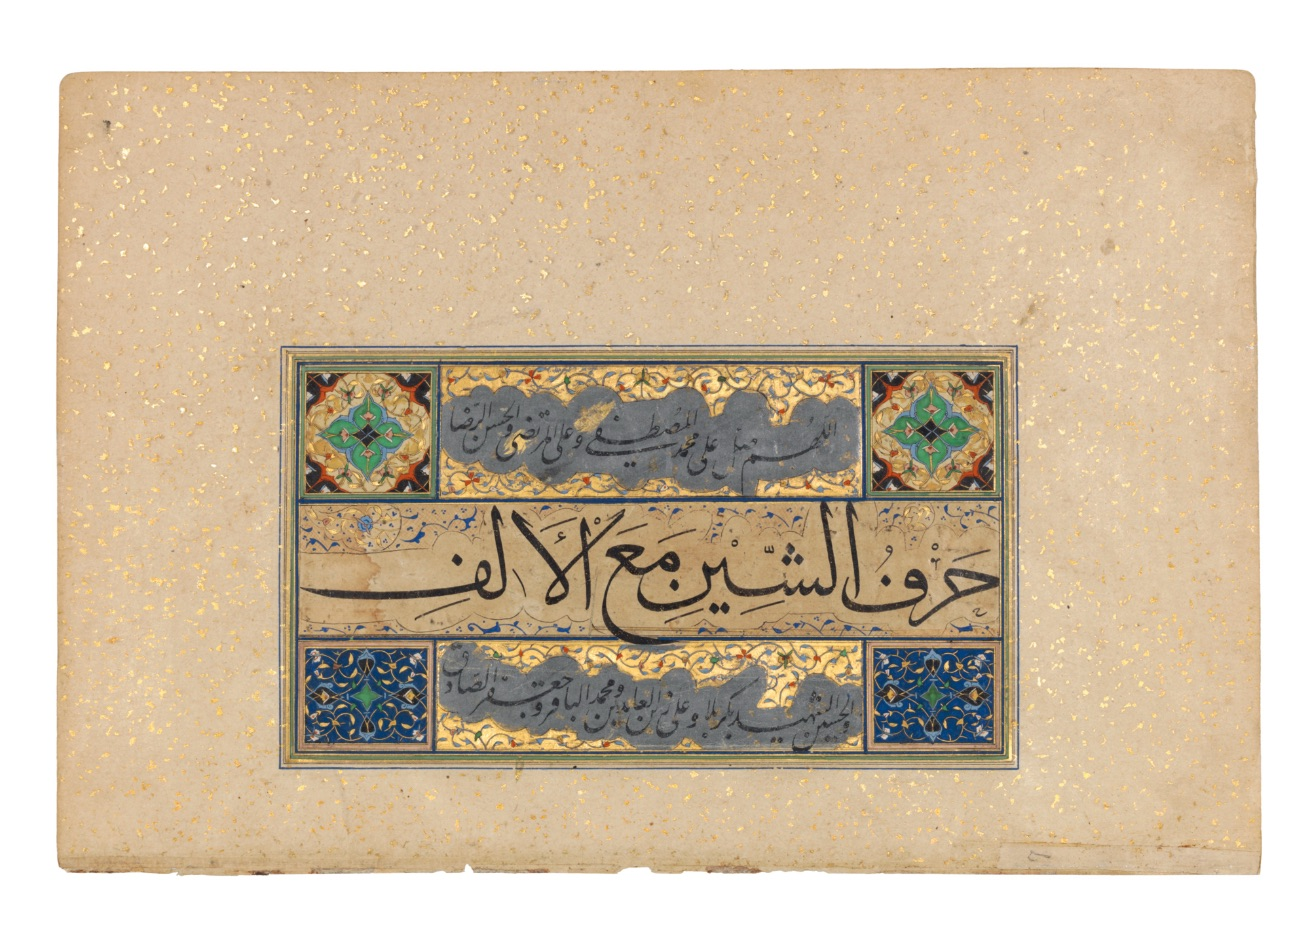 AN IMPORTANT ROYAL ALBUM PAGE COPIED BY SULTAN 'ALI MASHHADI